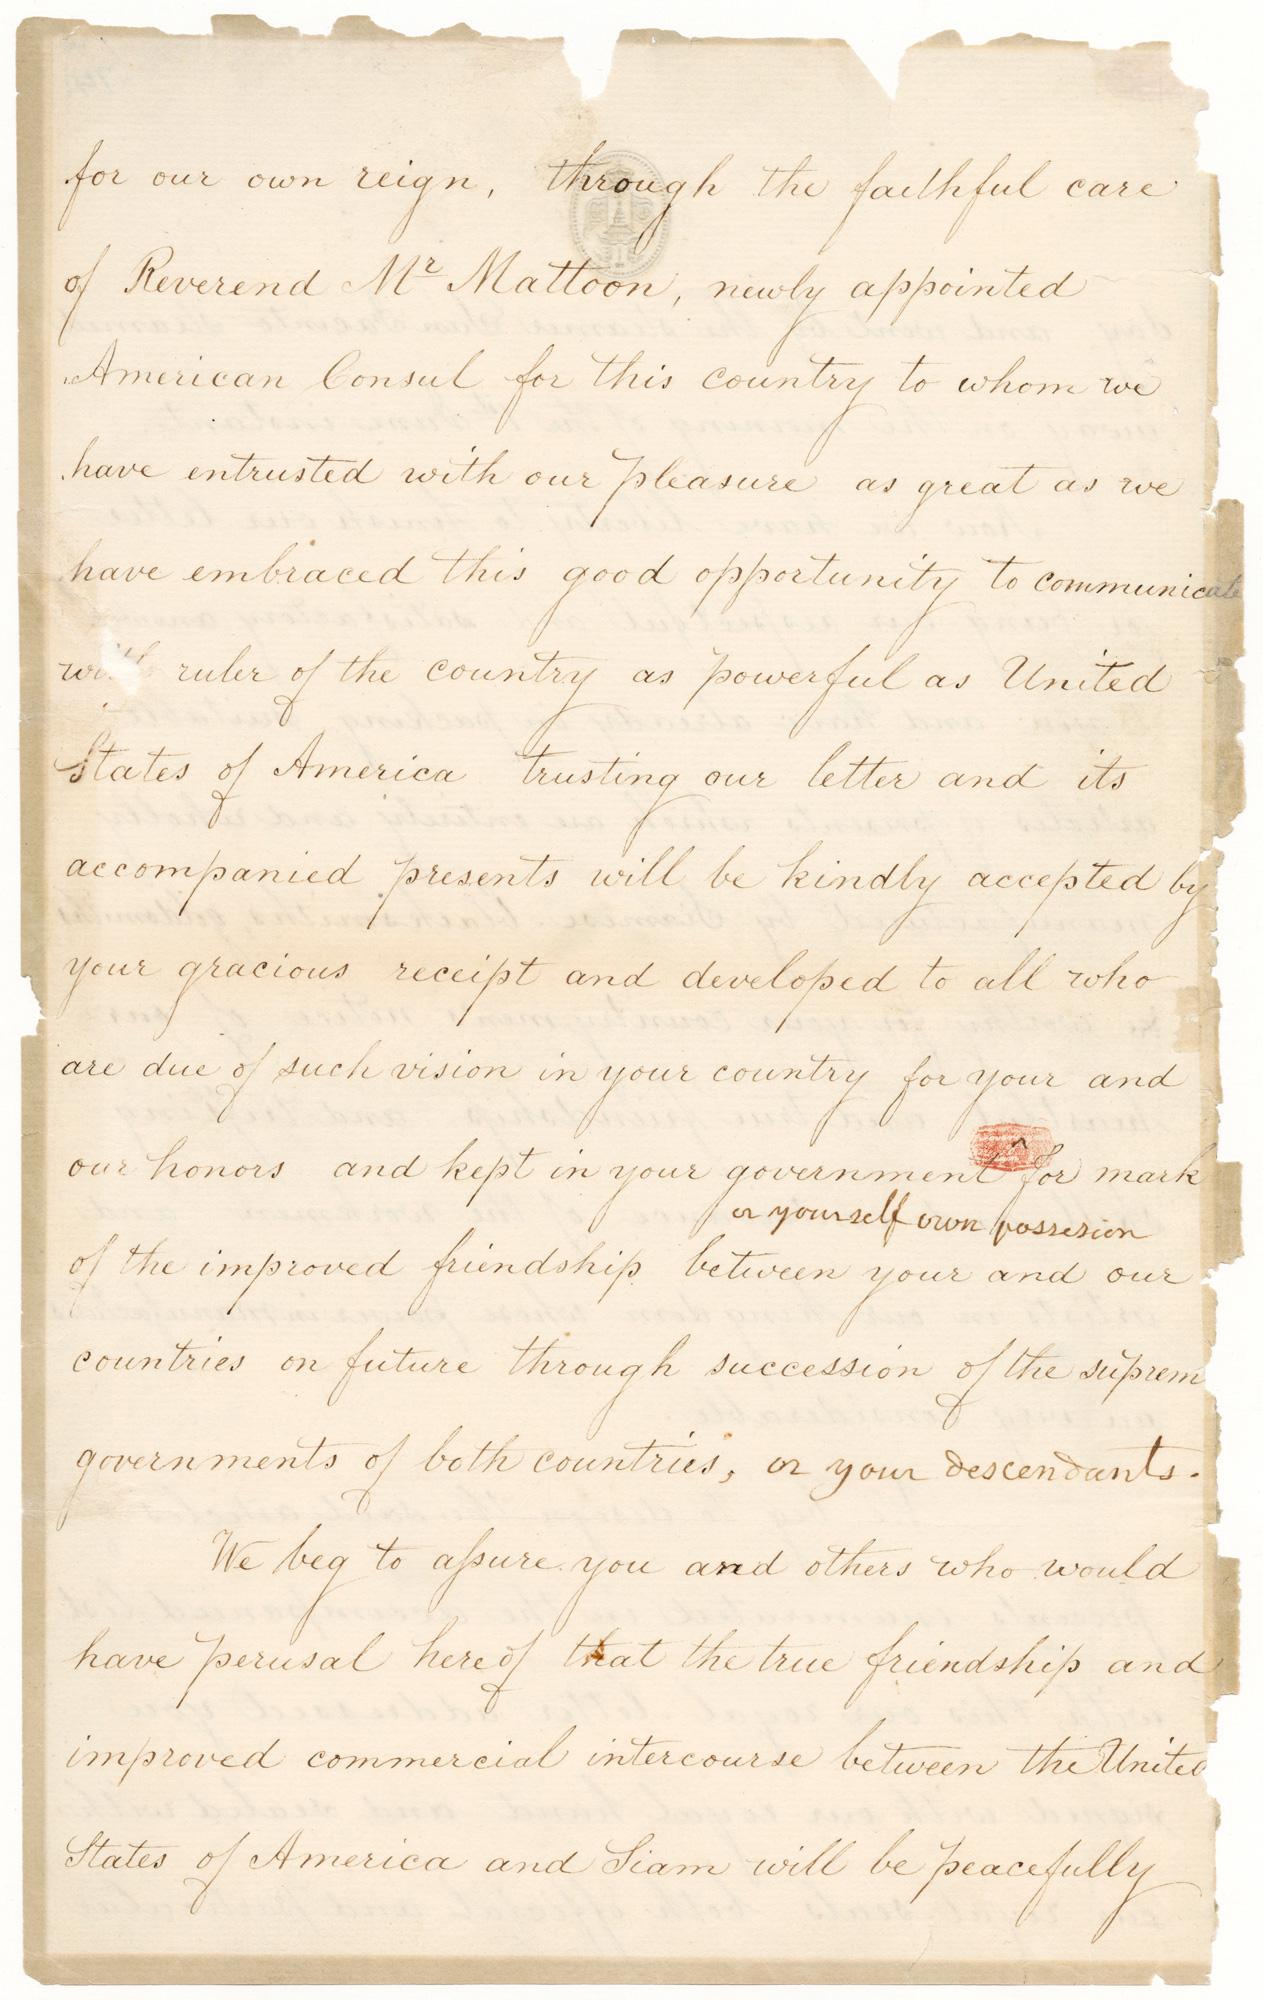 Letter from King Mongkut to President Franklin Pierce (excerpt), 1856 Courtesy of the National Archives and Records Administration, General Records of the United States Government; 6923528  พระราชสาส์นในพระบาทสมเด็จพระจอมเกล้าเจ้าอยู่หัว พระราชทานแก่ประธานาธิบดีแฟรงกลิน เพียร์ซ (ตัดมาบางส่วน) พ.ศ. ๒๓๙๙ ได้รับความอนุเคราะห์จากแผนกบันทึกทั่วไปของรัฐบาลสหรัฐอเมริกา องค์การบริหารจดหมายเหตุและบันทึกแห่งชาติ; 6923528